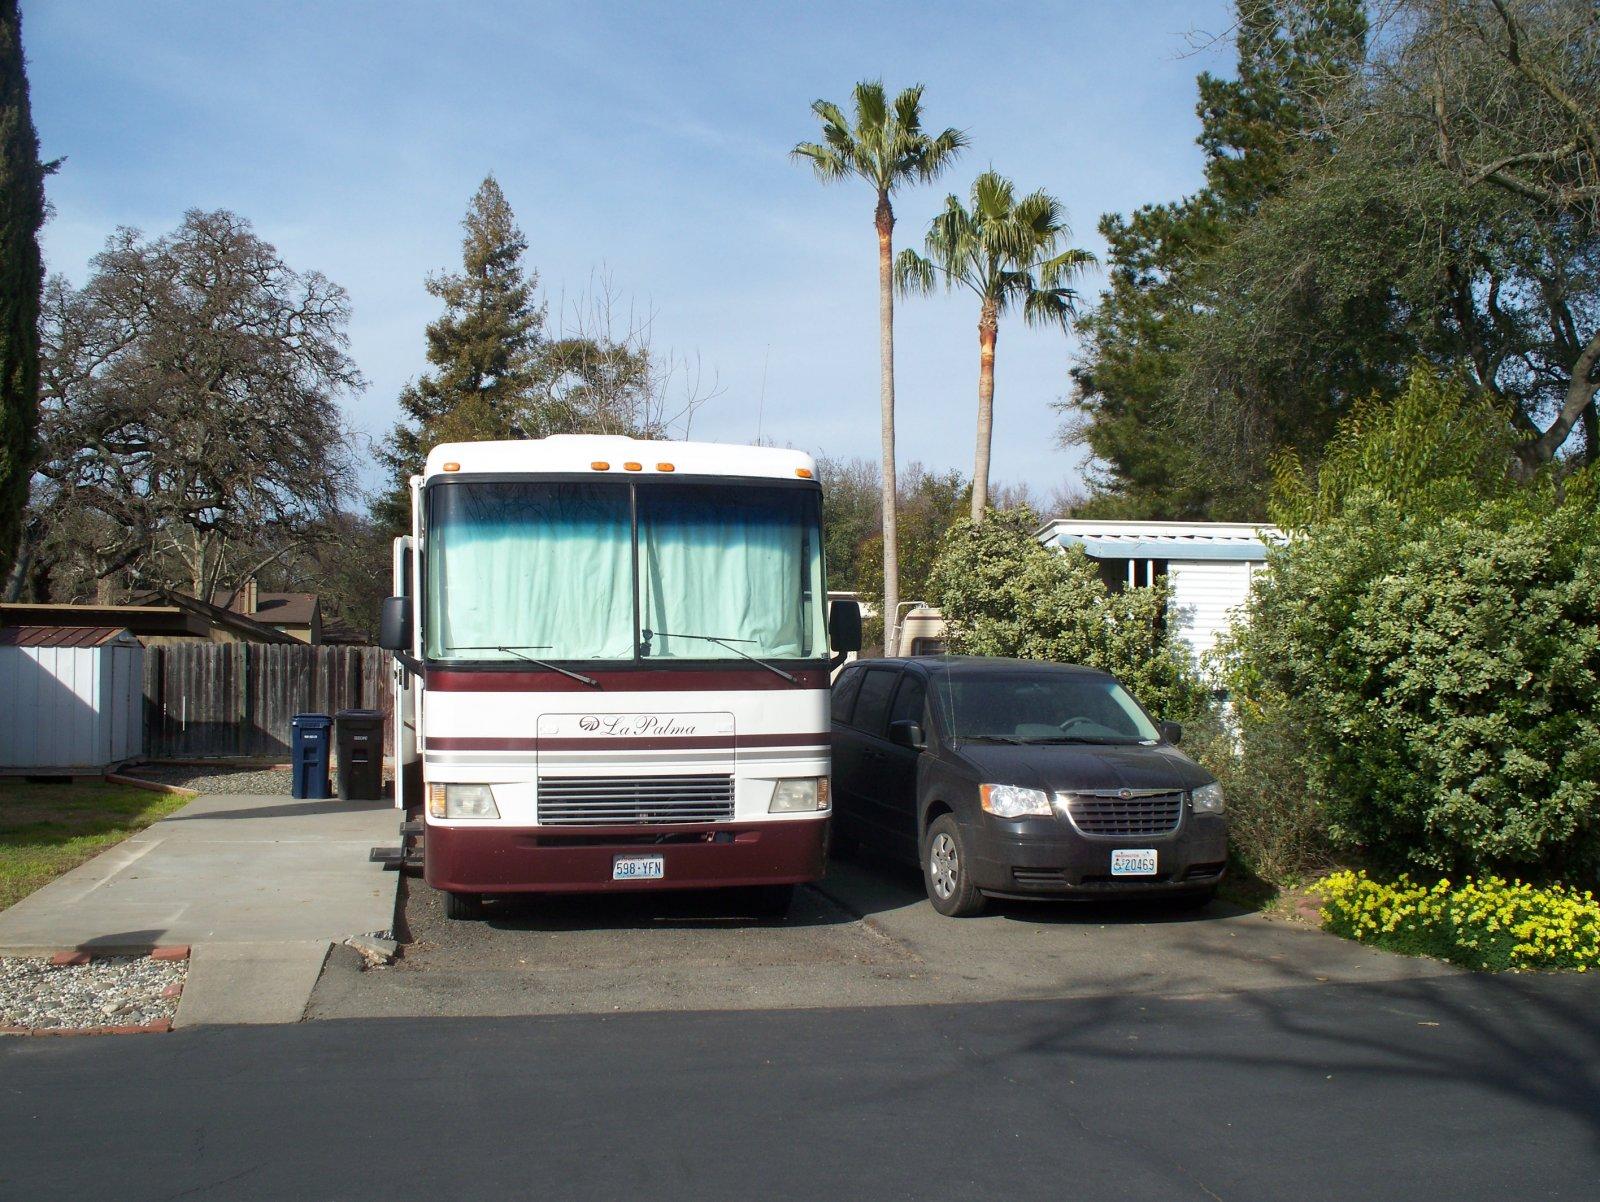 Click image for larger version  Name:Sacramento, CA.jpg Views:82 Size:426.7 KB ID:26245